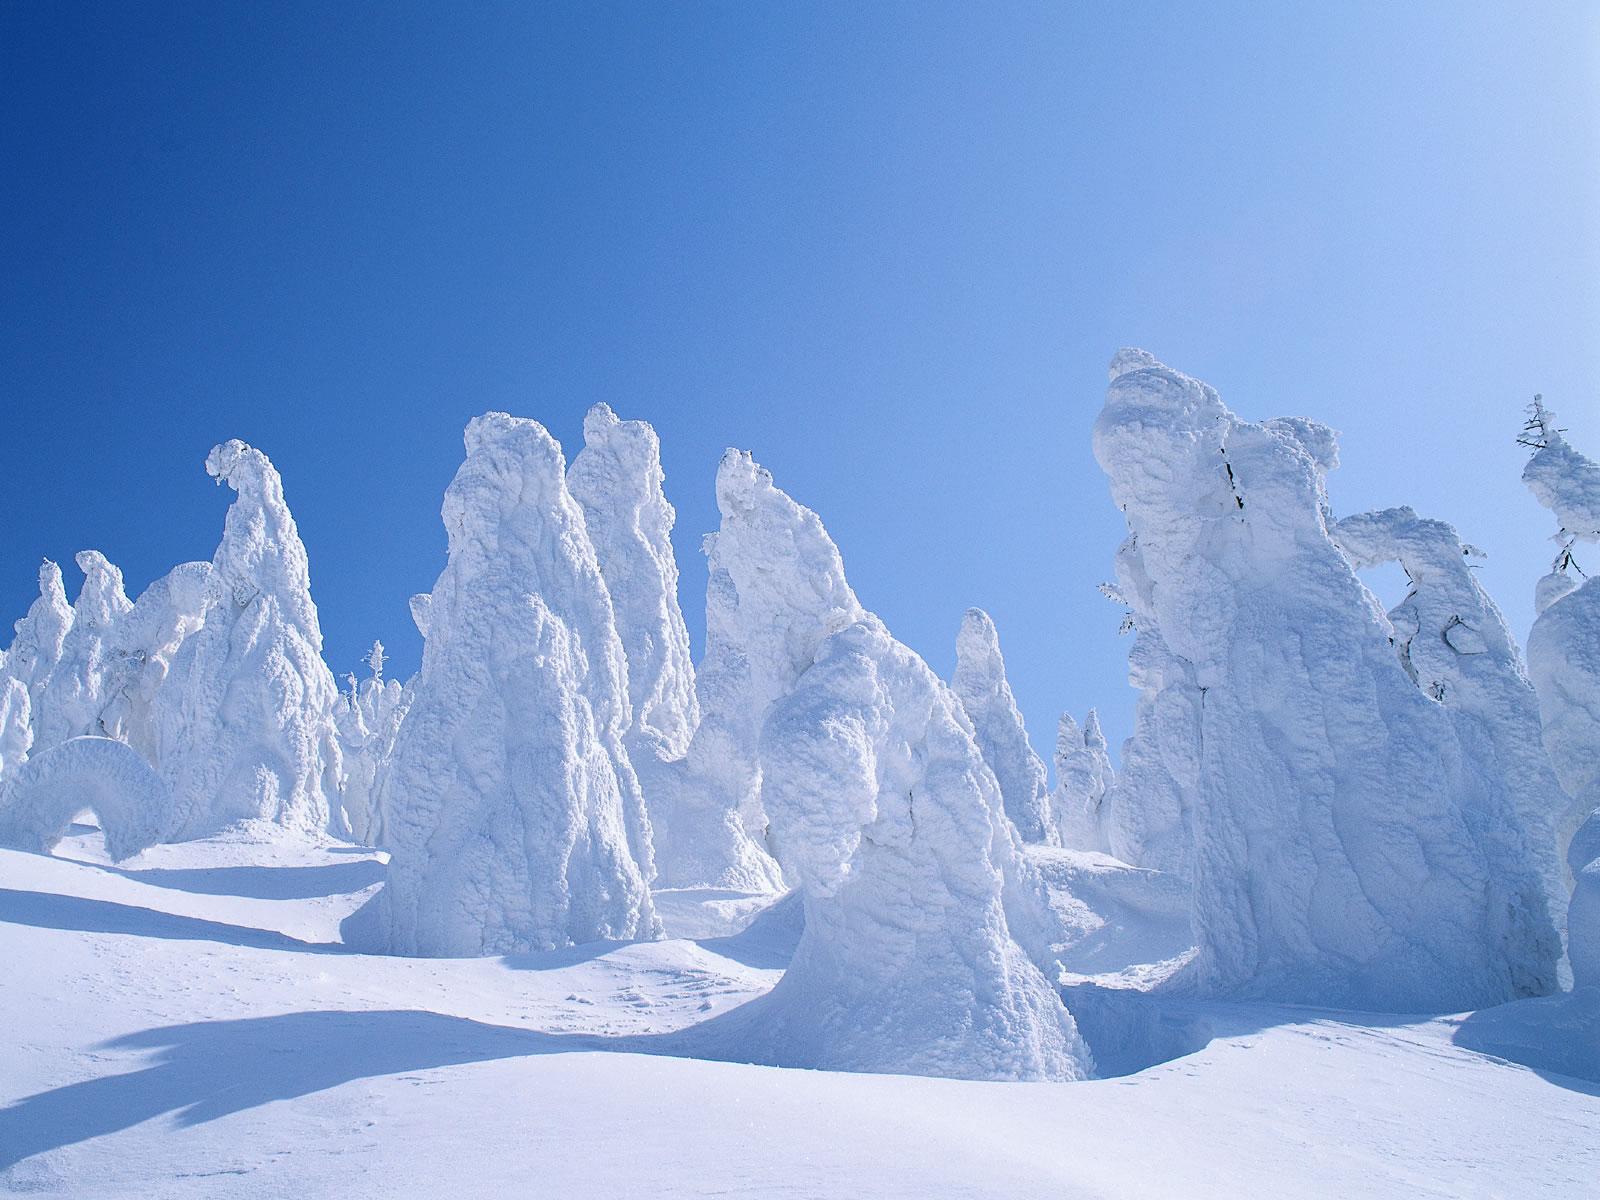 snow backgrounds for desktop falling snow backgrounds for desktop 1600x1200